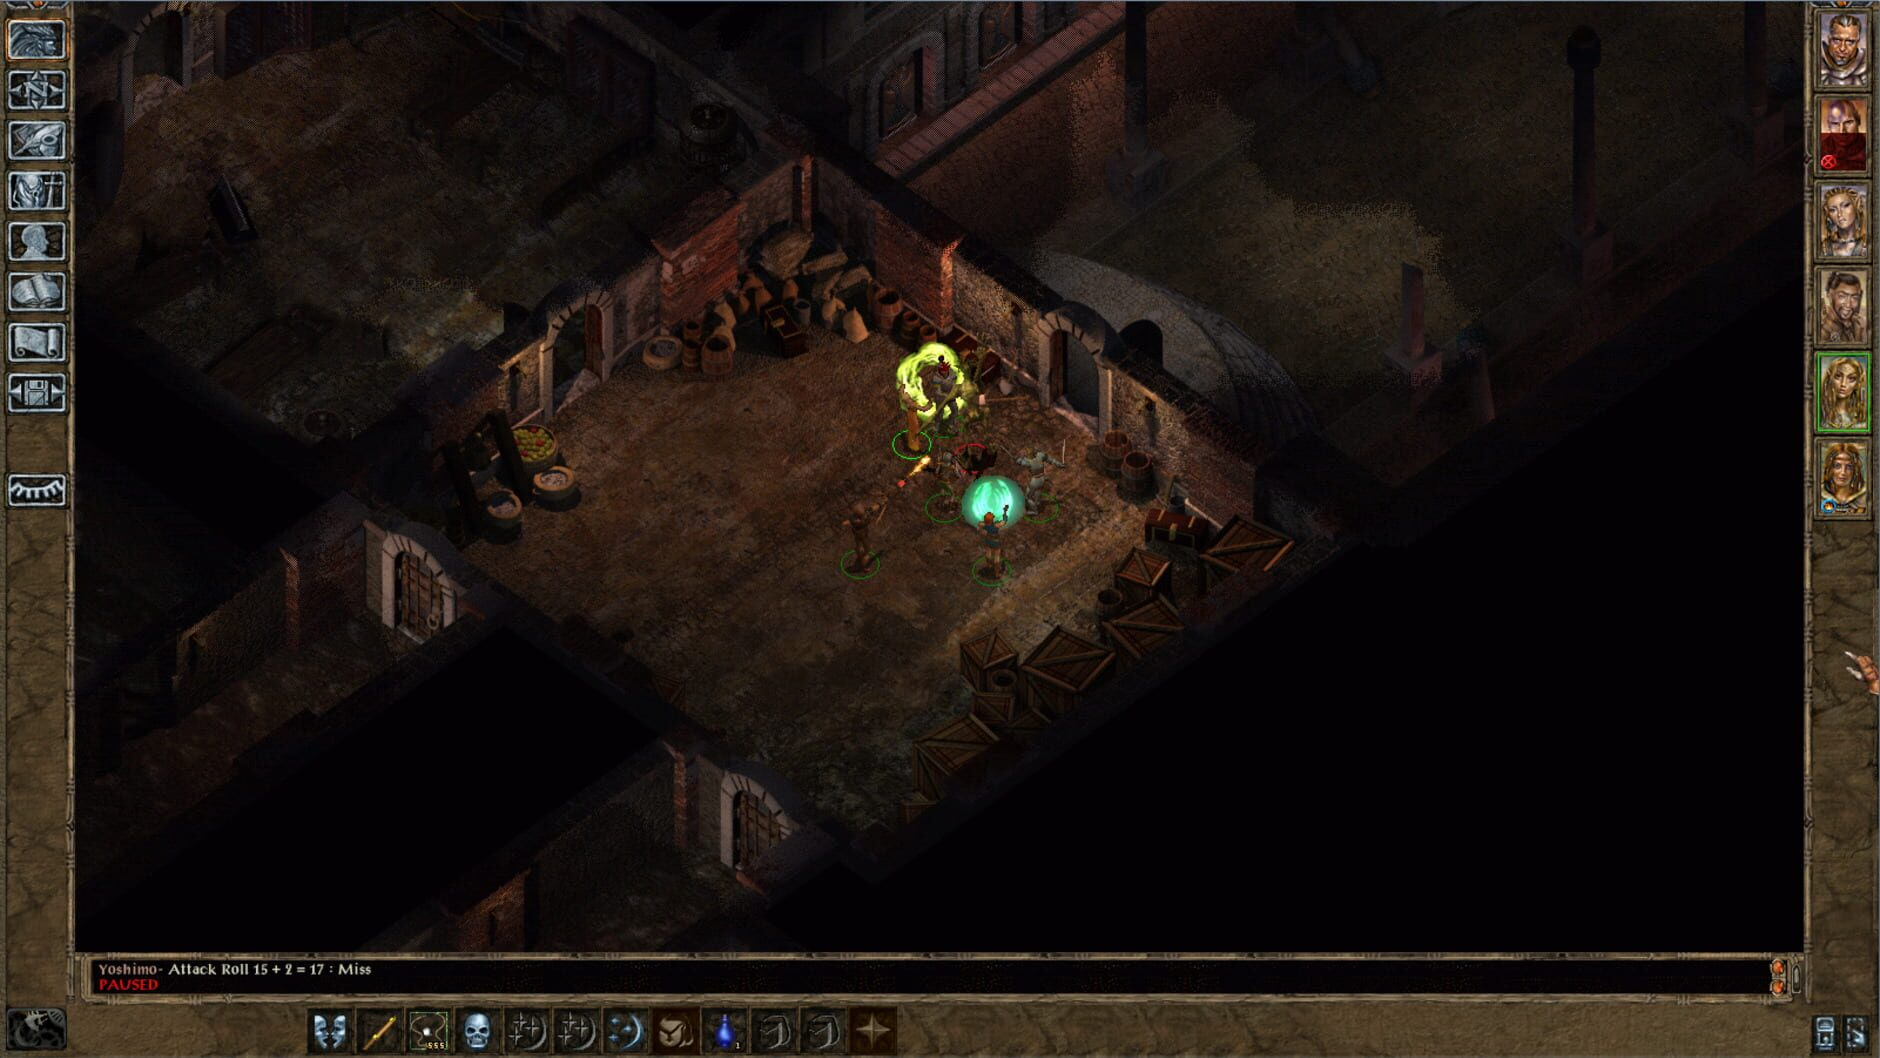 Baldur's Gate II: Shadows Of Amn - 2